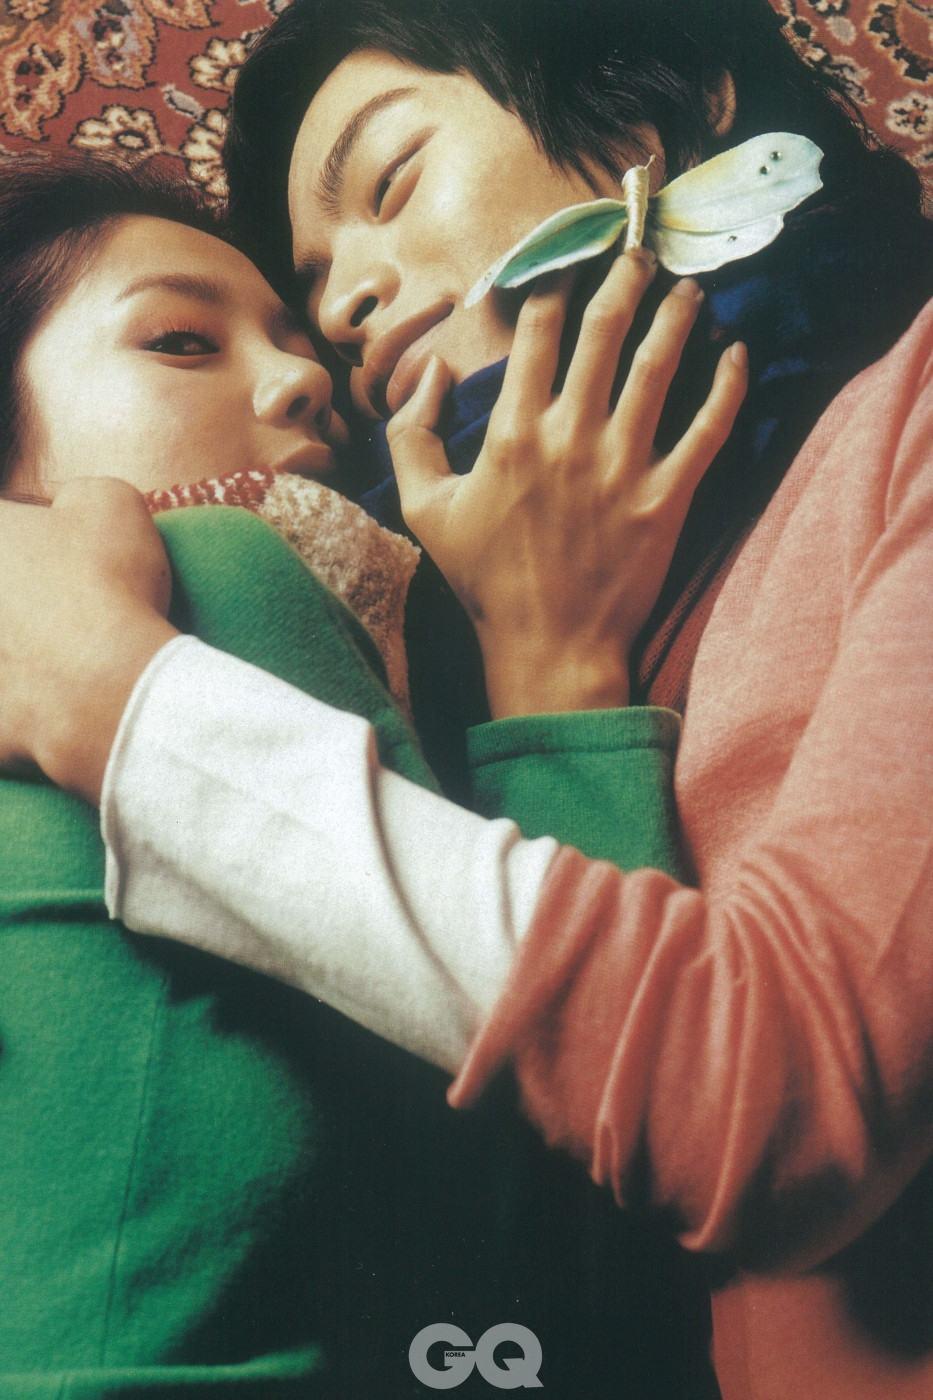 GQ KOREA 2004년 10월 화보 ' Mama's & Papa's in Check'